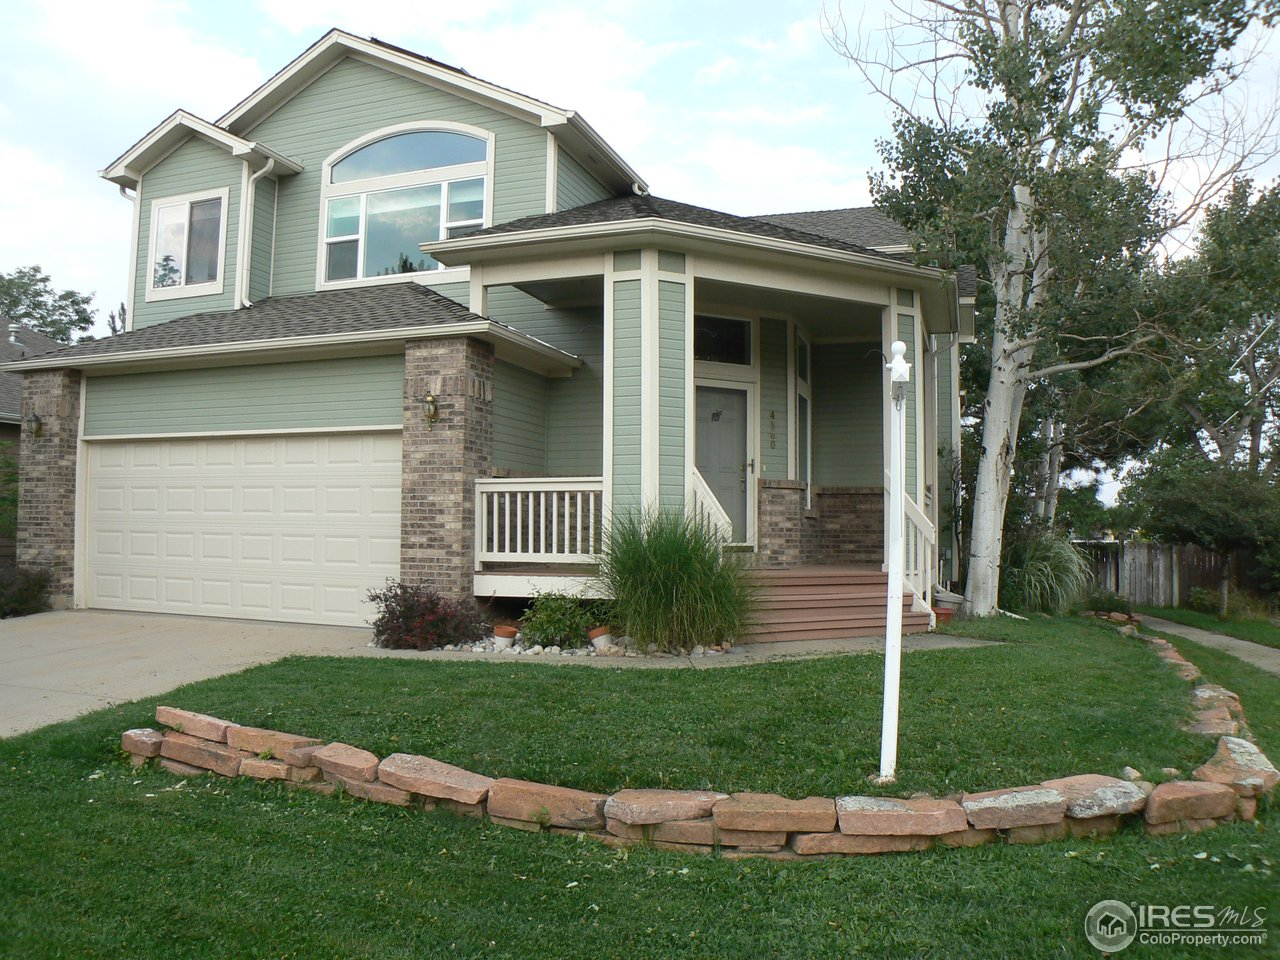 4860 10th St, Boulder CO 80304